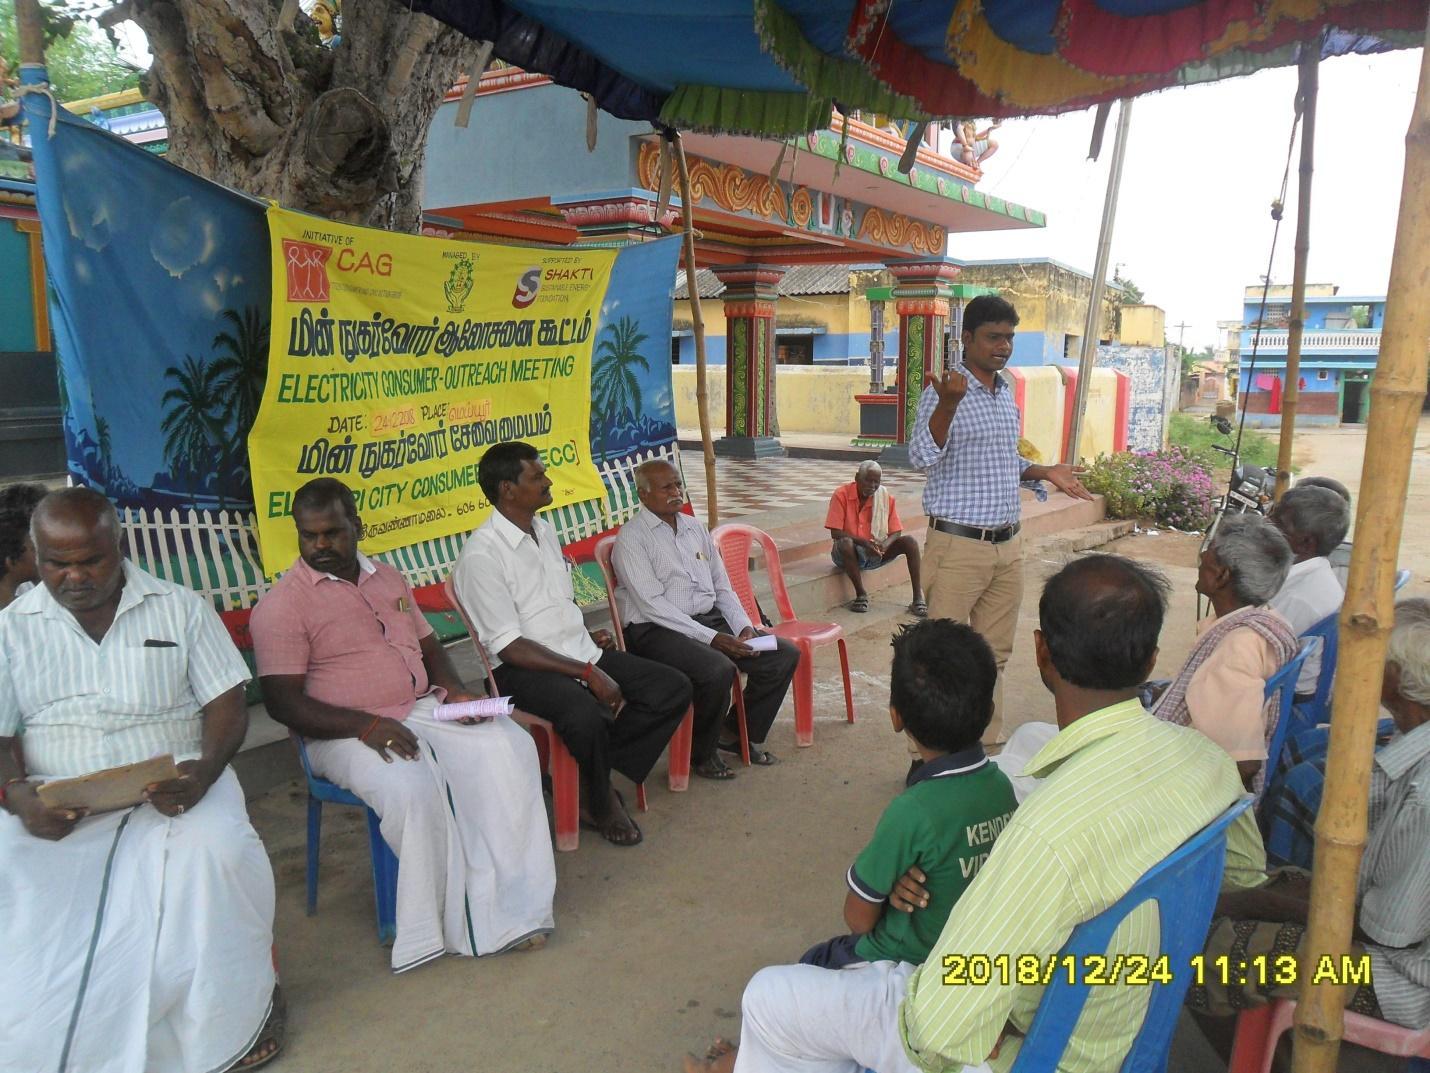 D:\Outreach Meeting PHOTOS\December\Thiruvannamalai\SAM_1262 - Consumer Tiruvannamalai.JPG